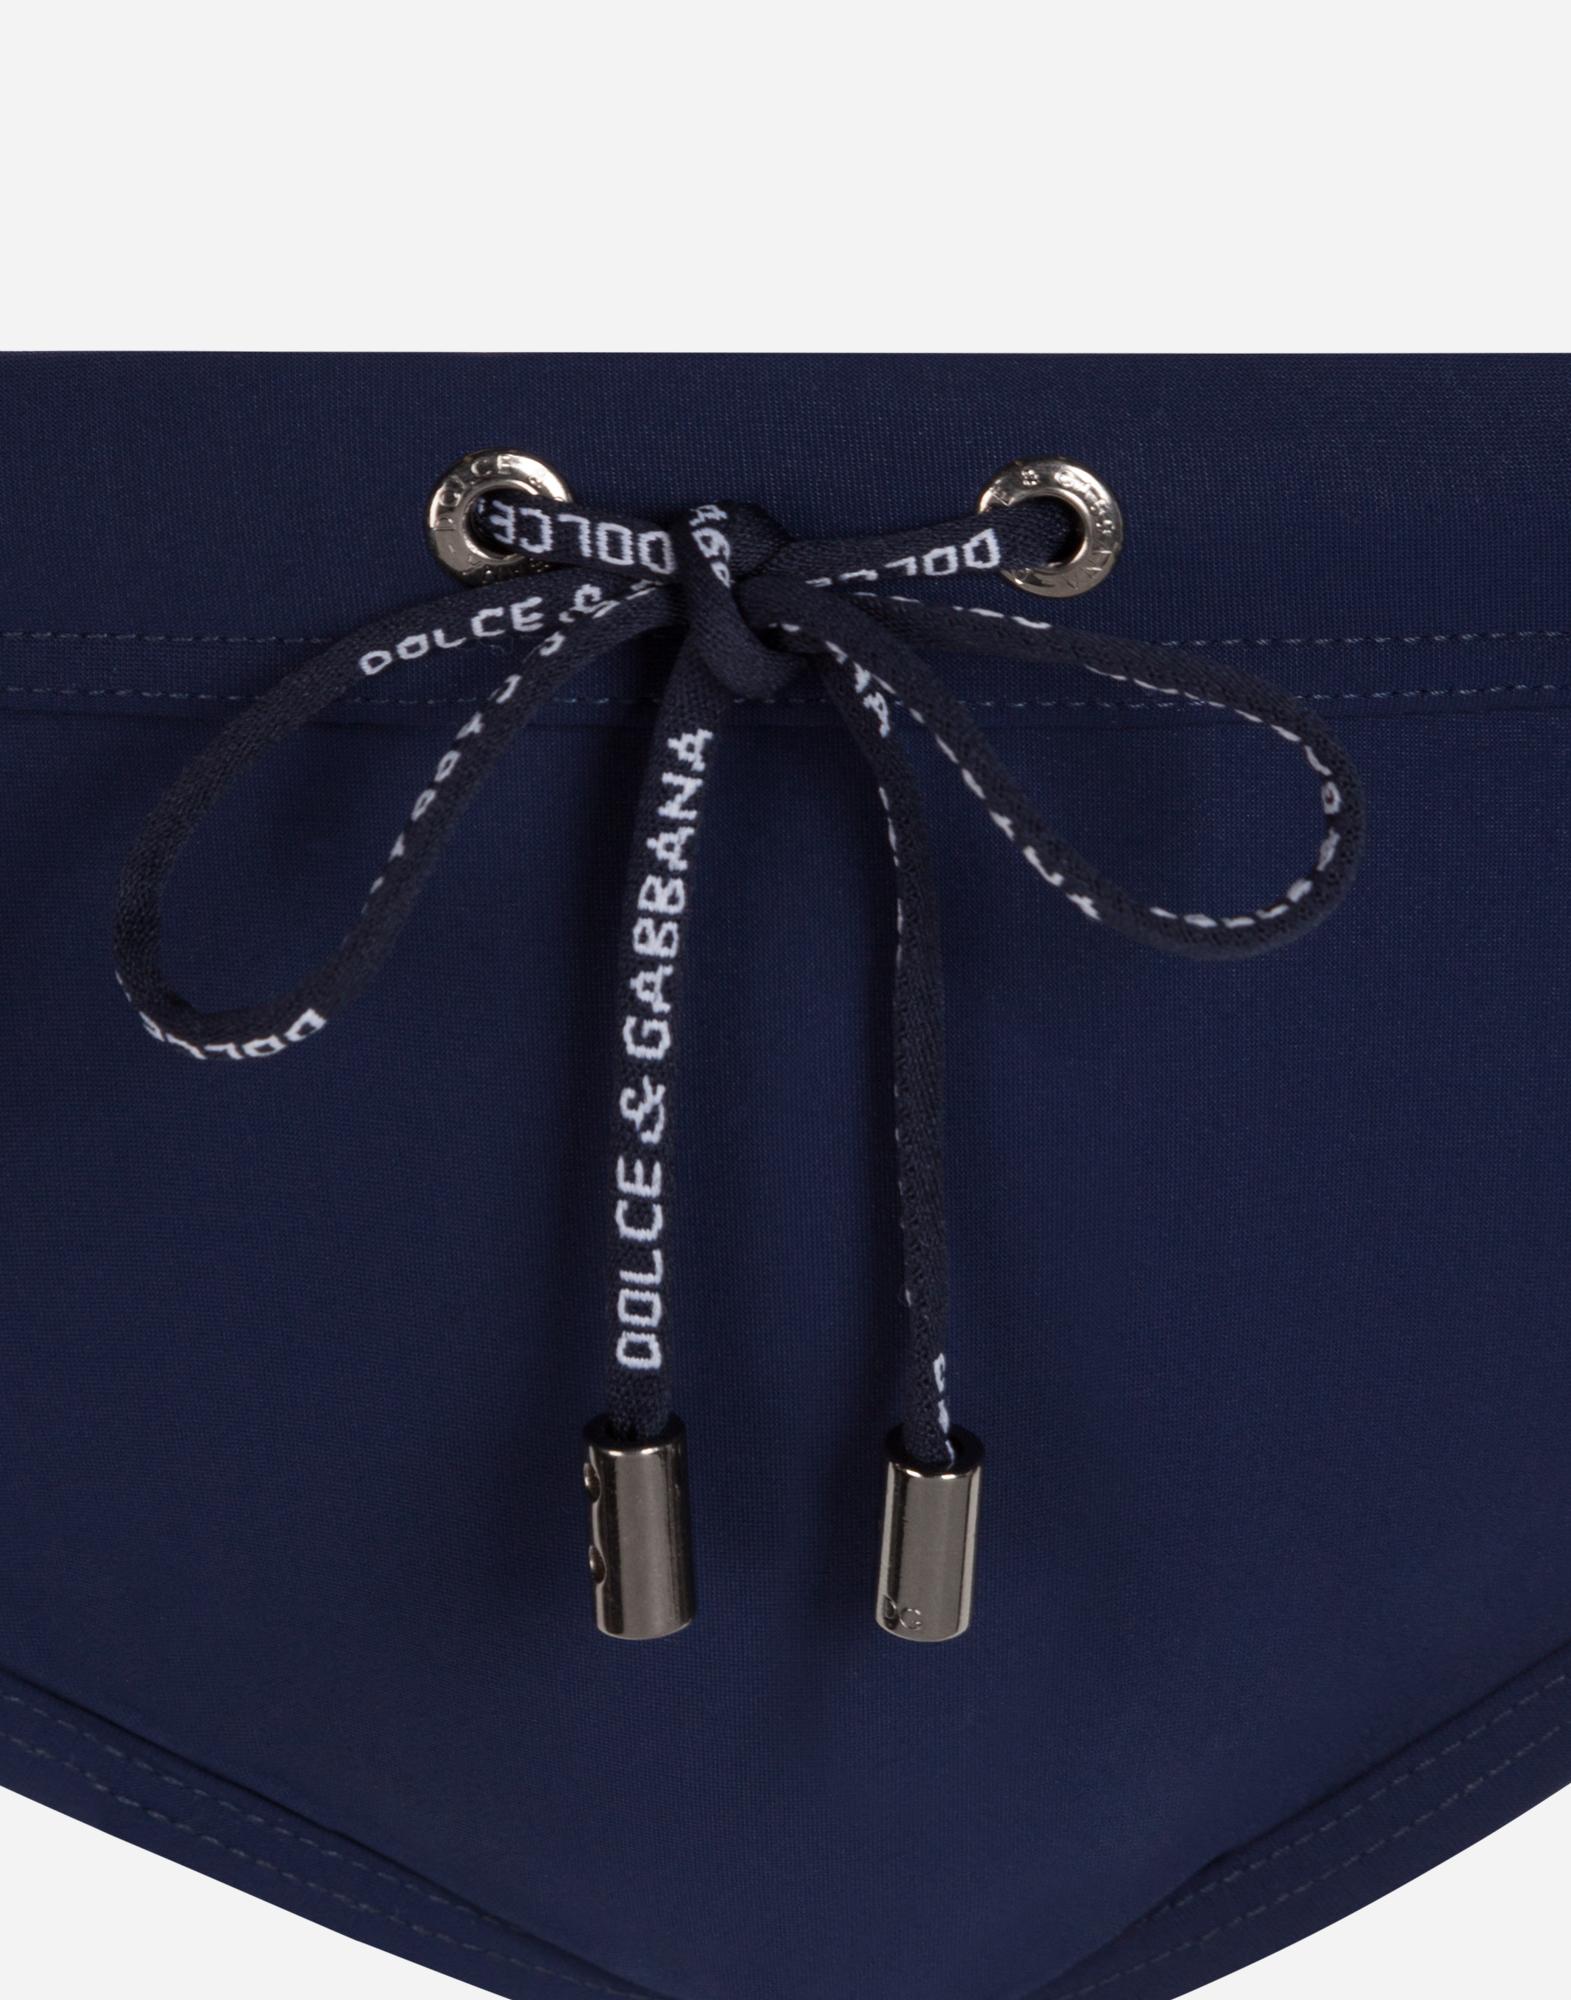 Dolce & Gabbana BEACH BRIEFS